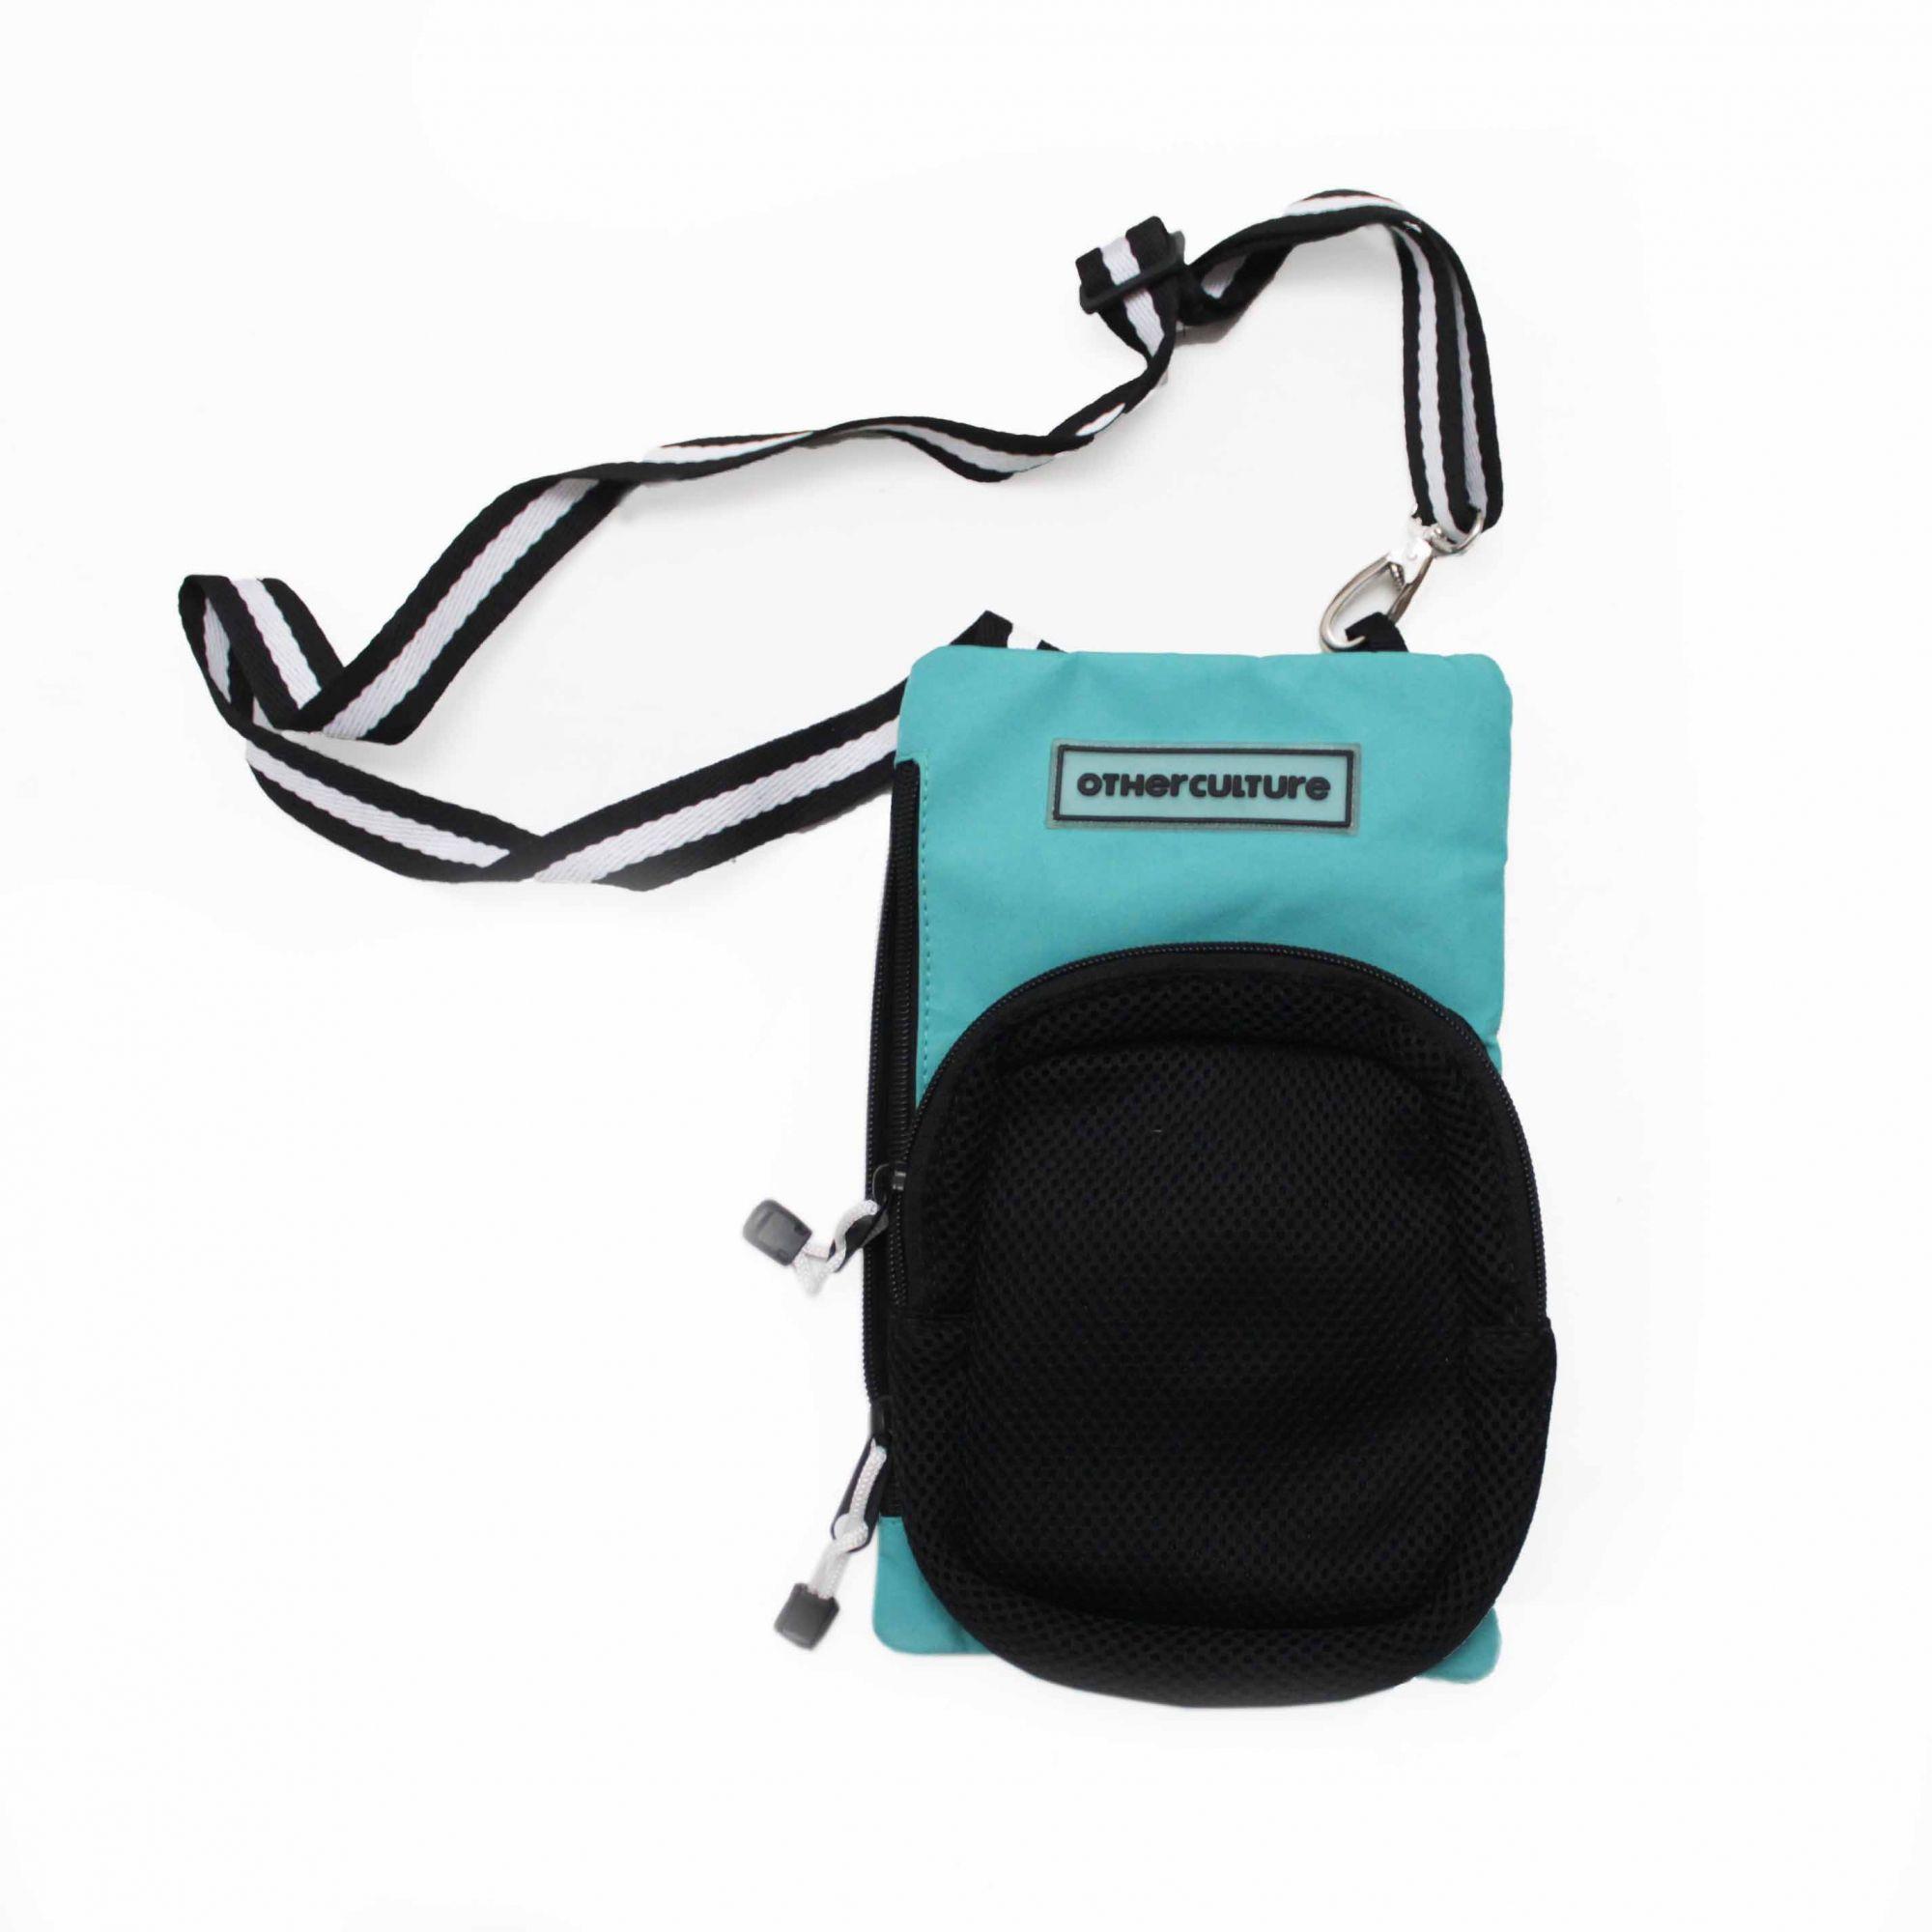 Shoulder Bag Other Culture Sport Tiffany Azul